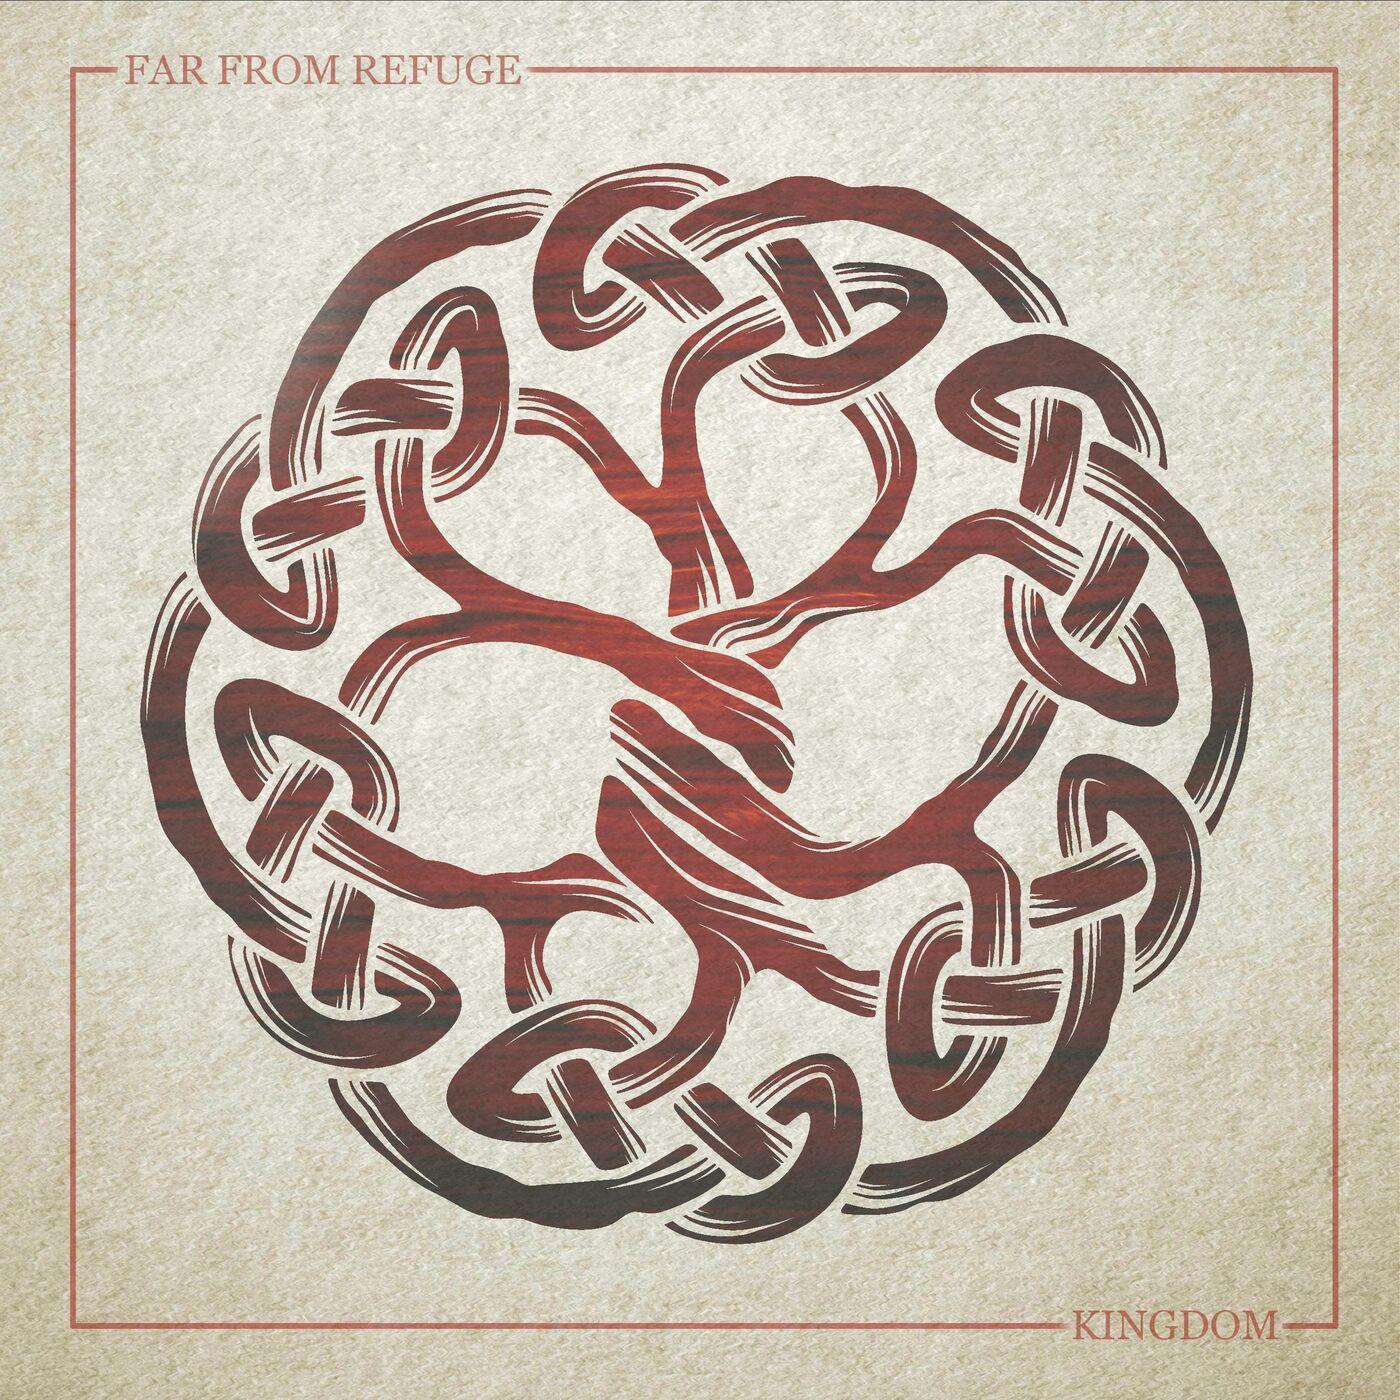 Far From Refuge - Kingdom [single] (2020)